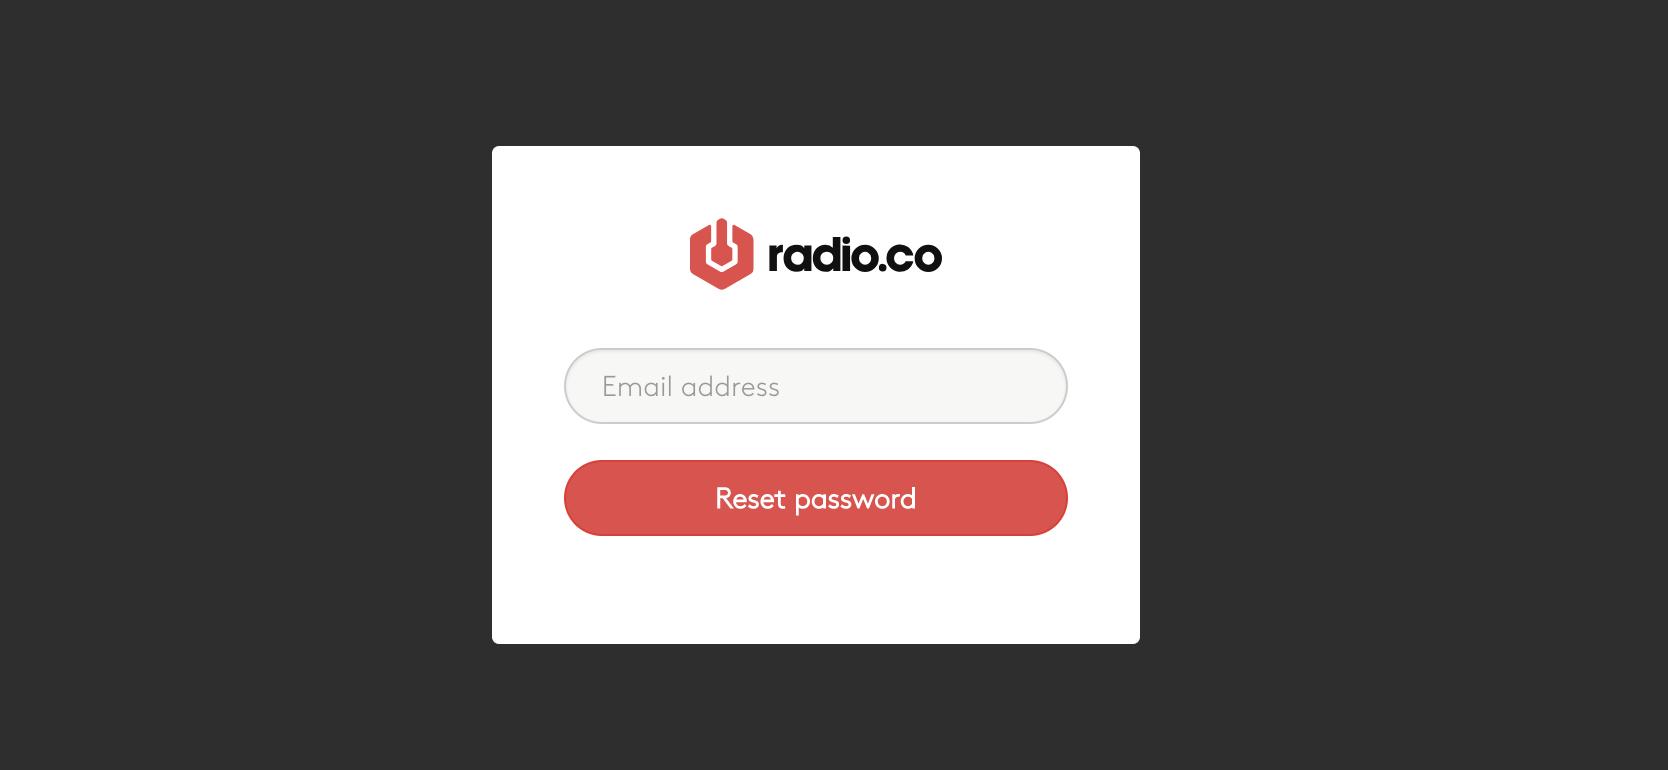 Enter Radio.co email